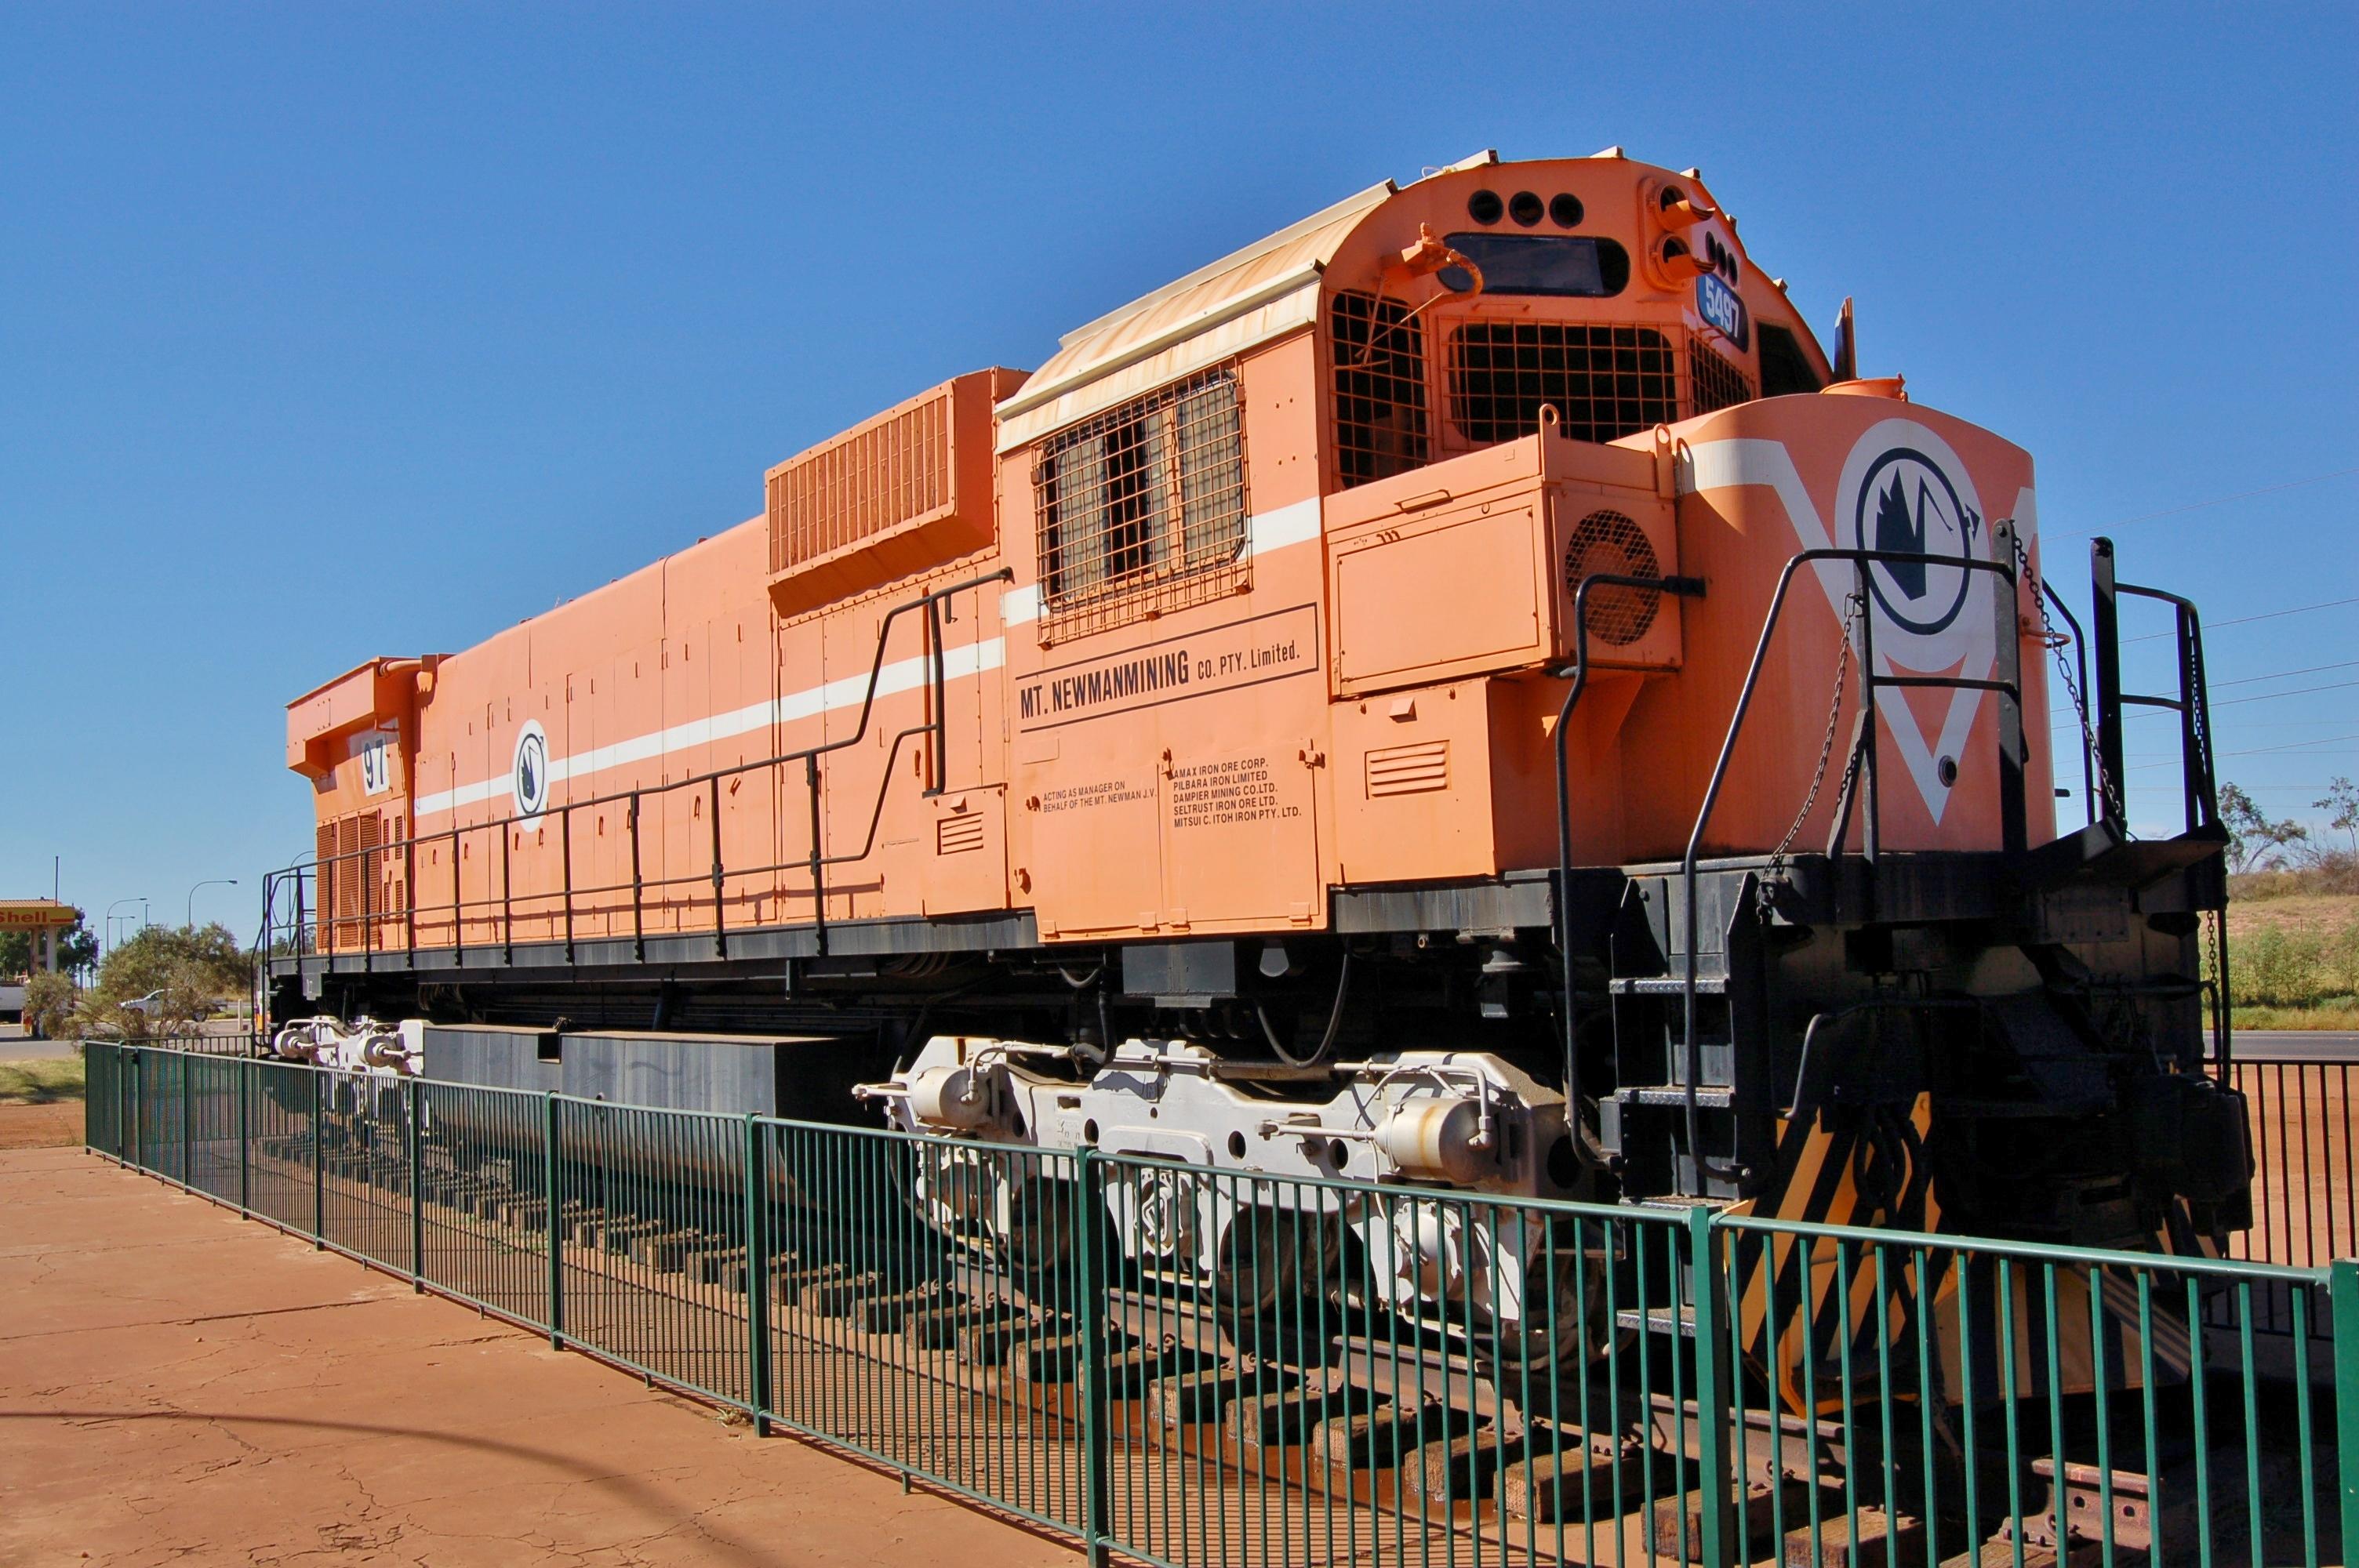 Ex Mining Cars For Sale Western Australia